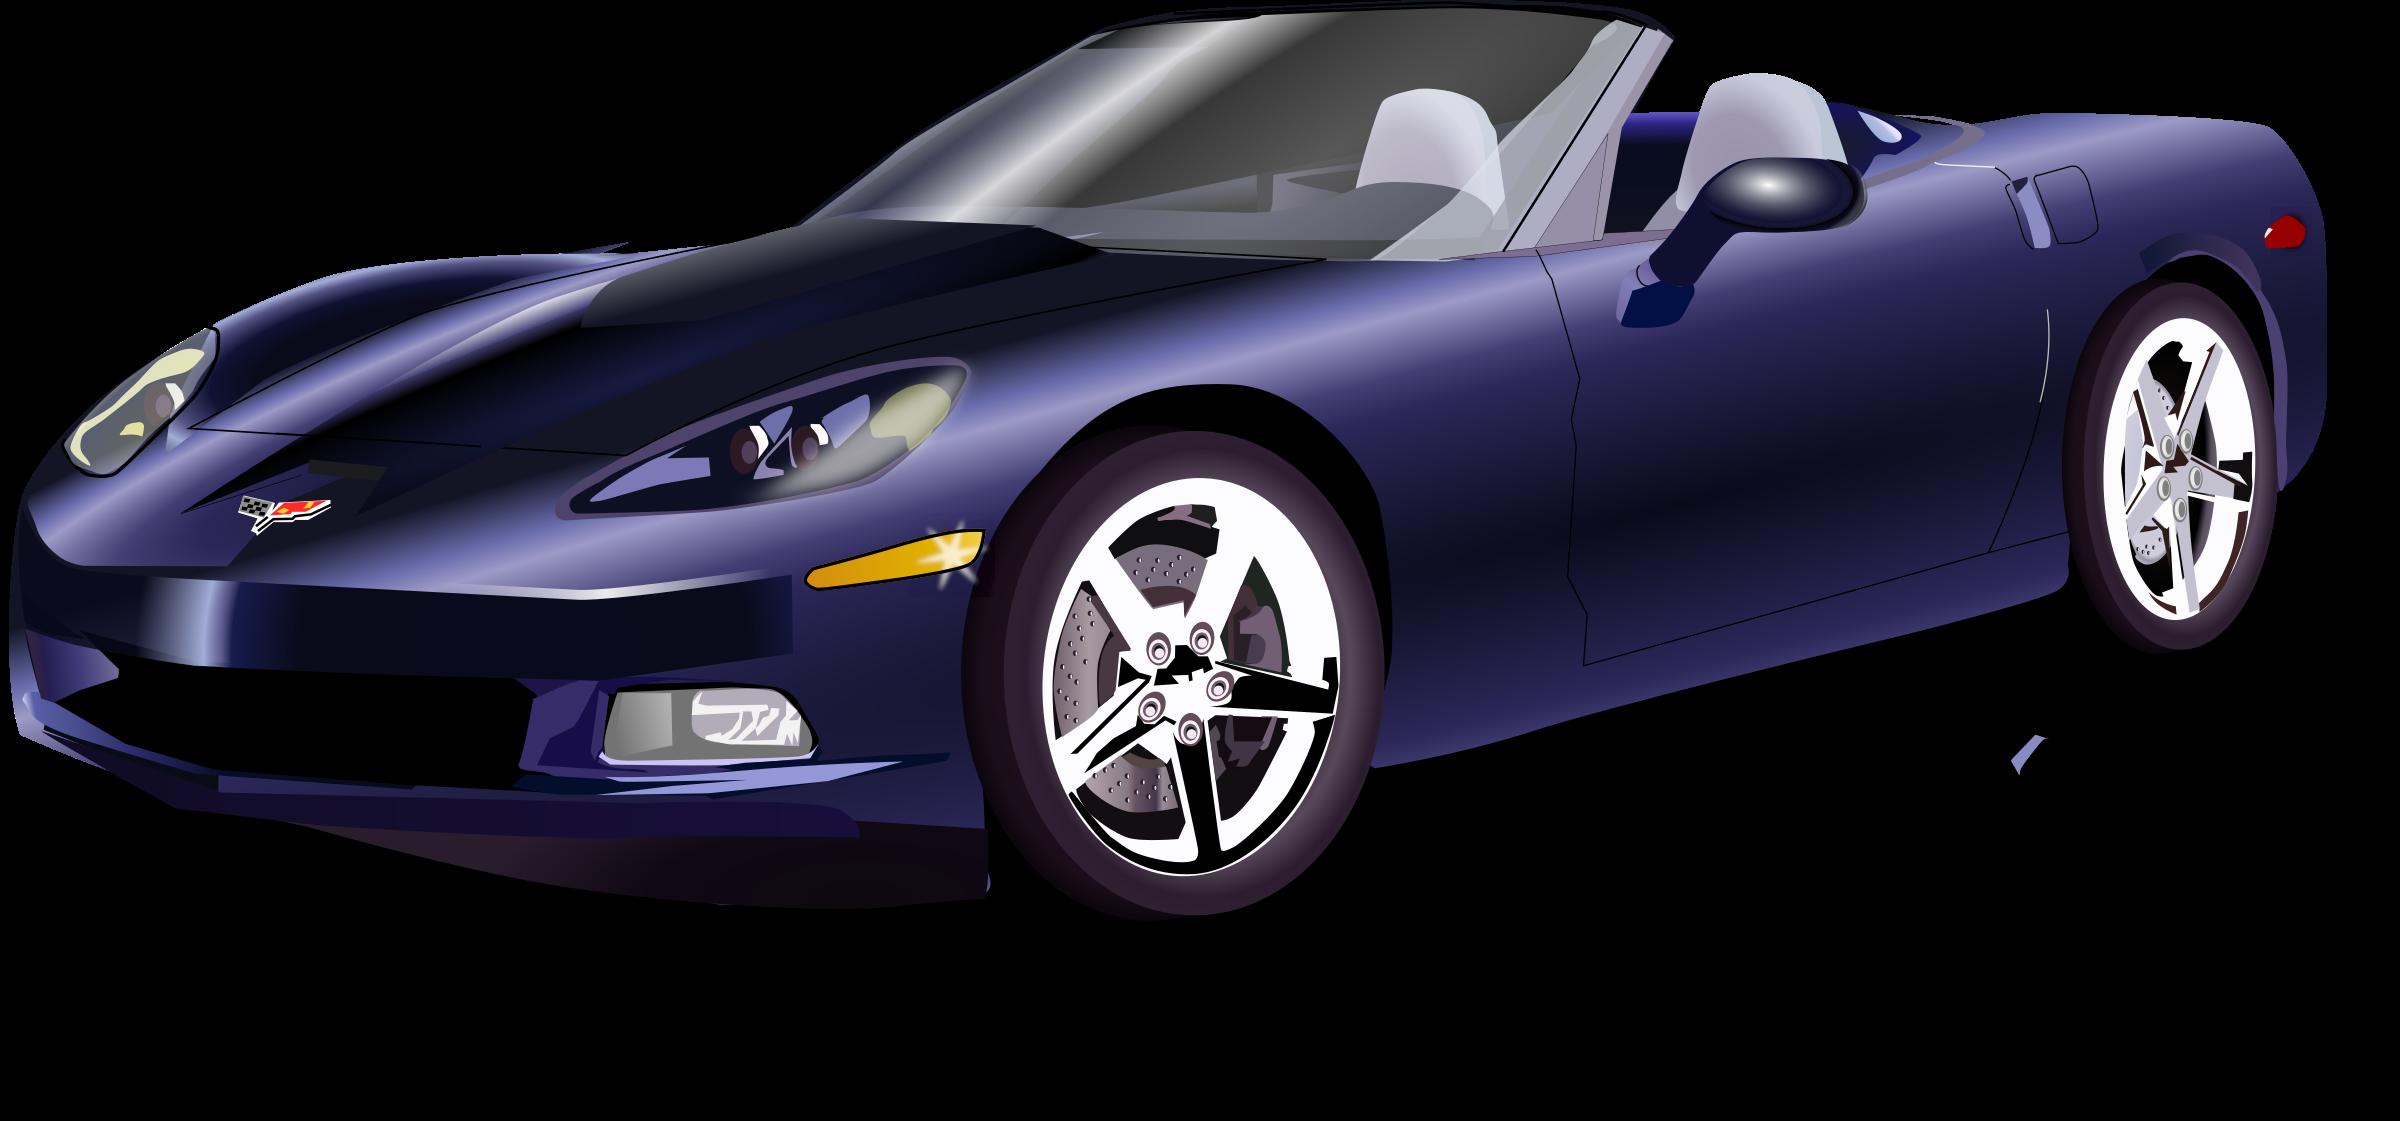 Car turbo clipart graphic free stock Clipart - Vette graphic free stock